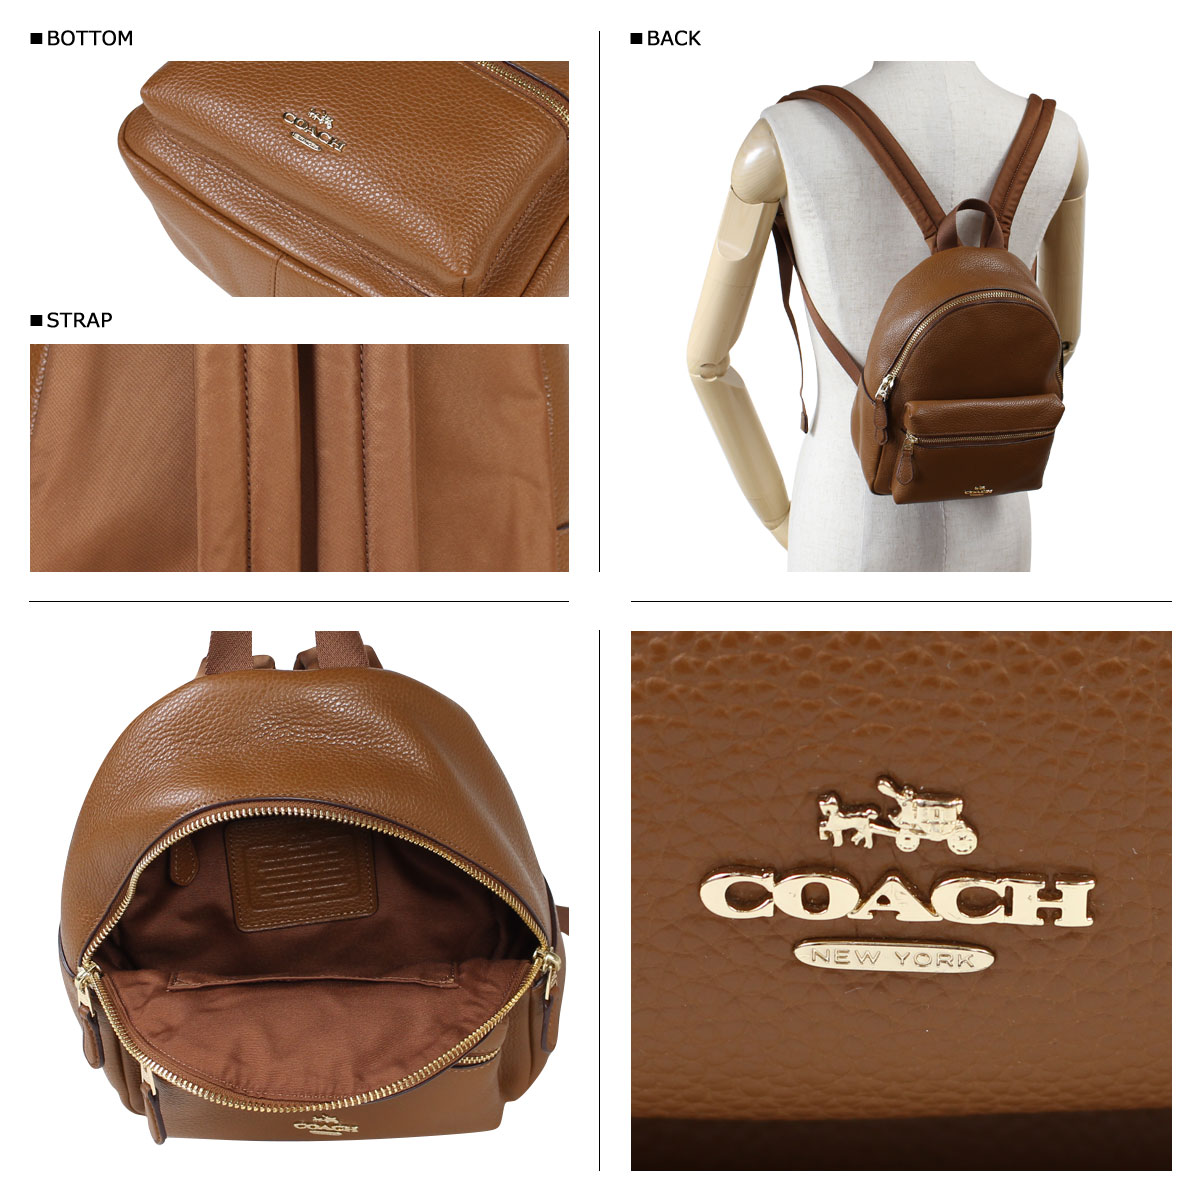 37d776b477 ... promo code for coach charlie pebble leather backpack f38288 source  sugar online shop rakuten global market